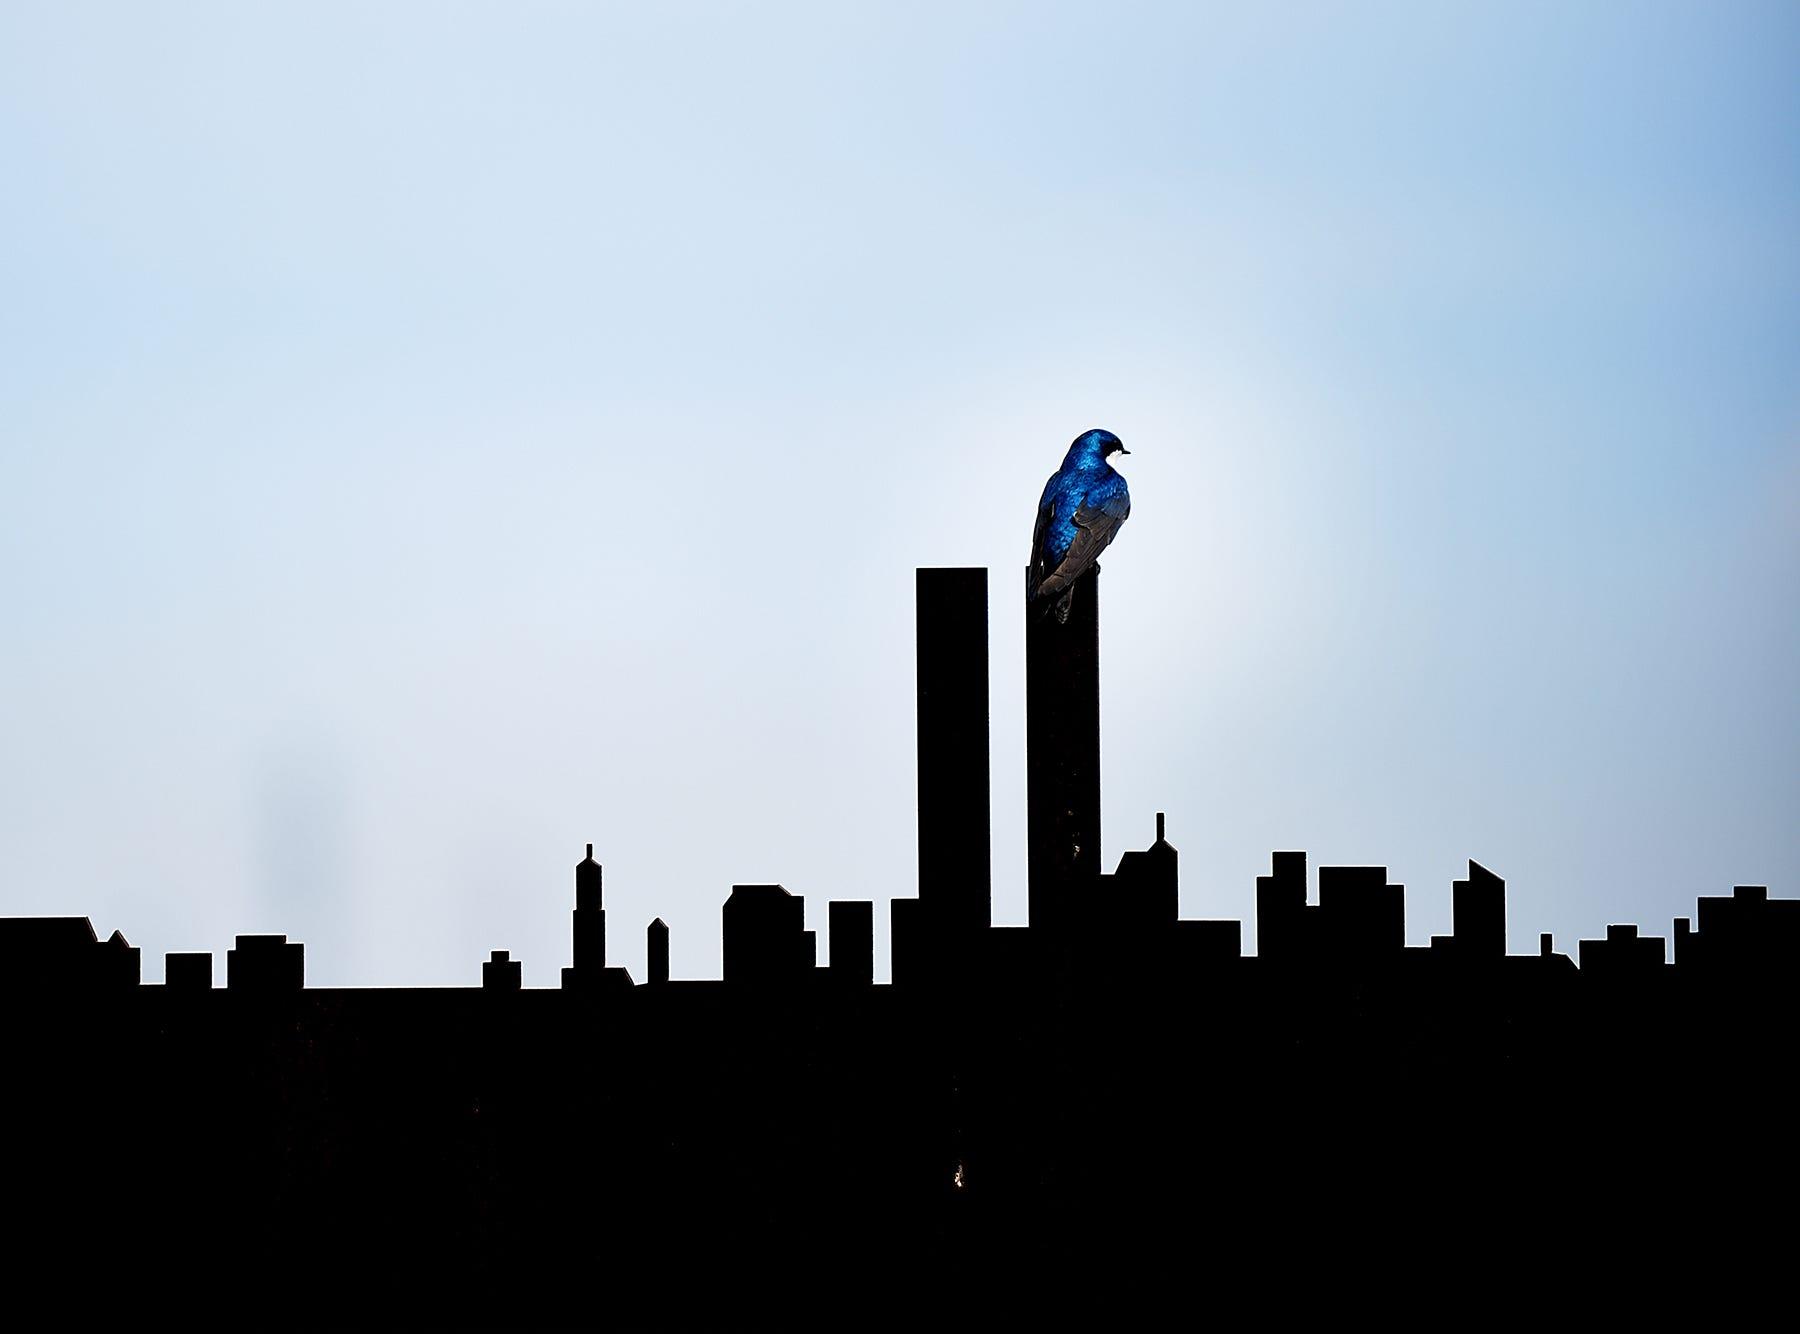 A bird sits atop a sculpture of the New York City skyline at Richard W. DeKorte Park in Lyndhurst, NJ on Thursday May 17, 2018.